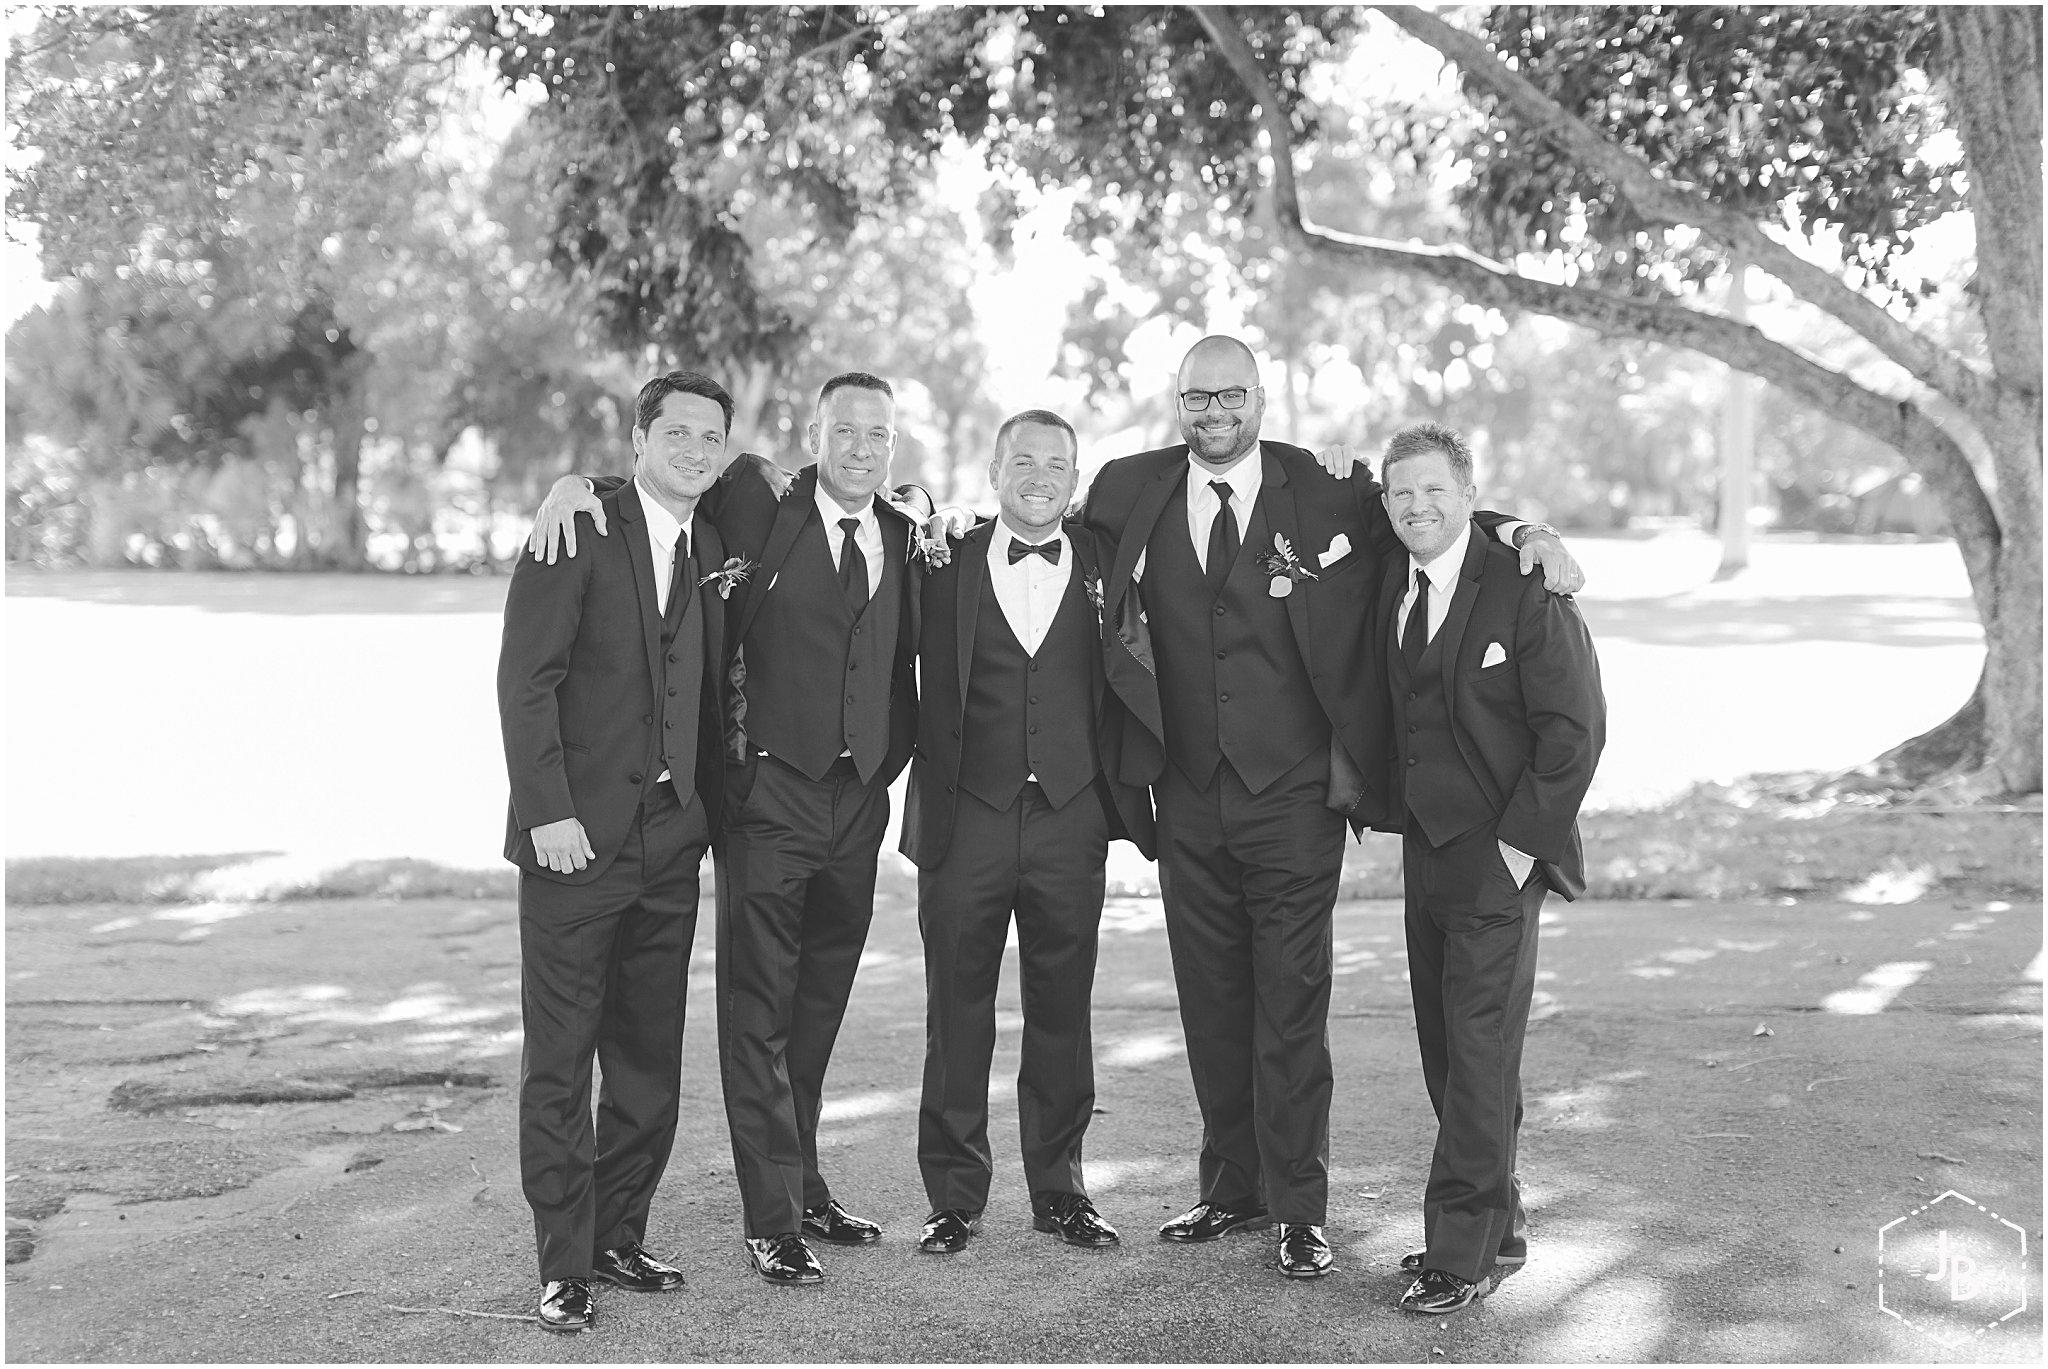 WeddingandEngagementFloridaPhotographer_0236.jpg